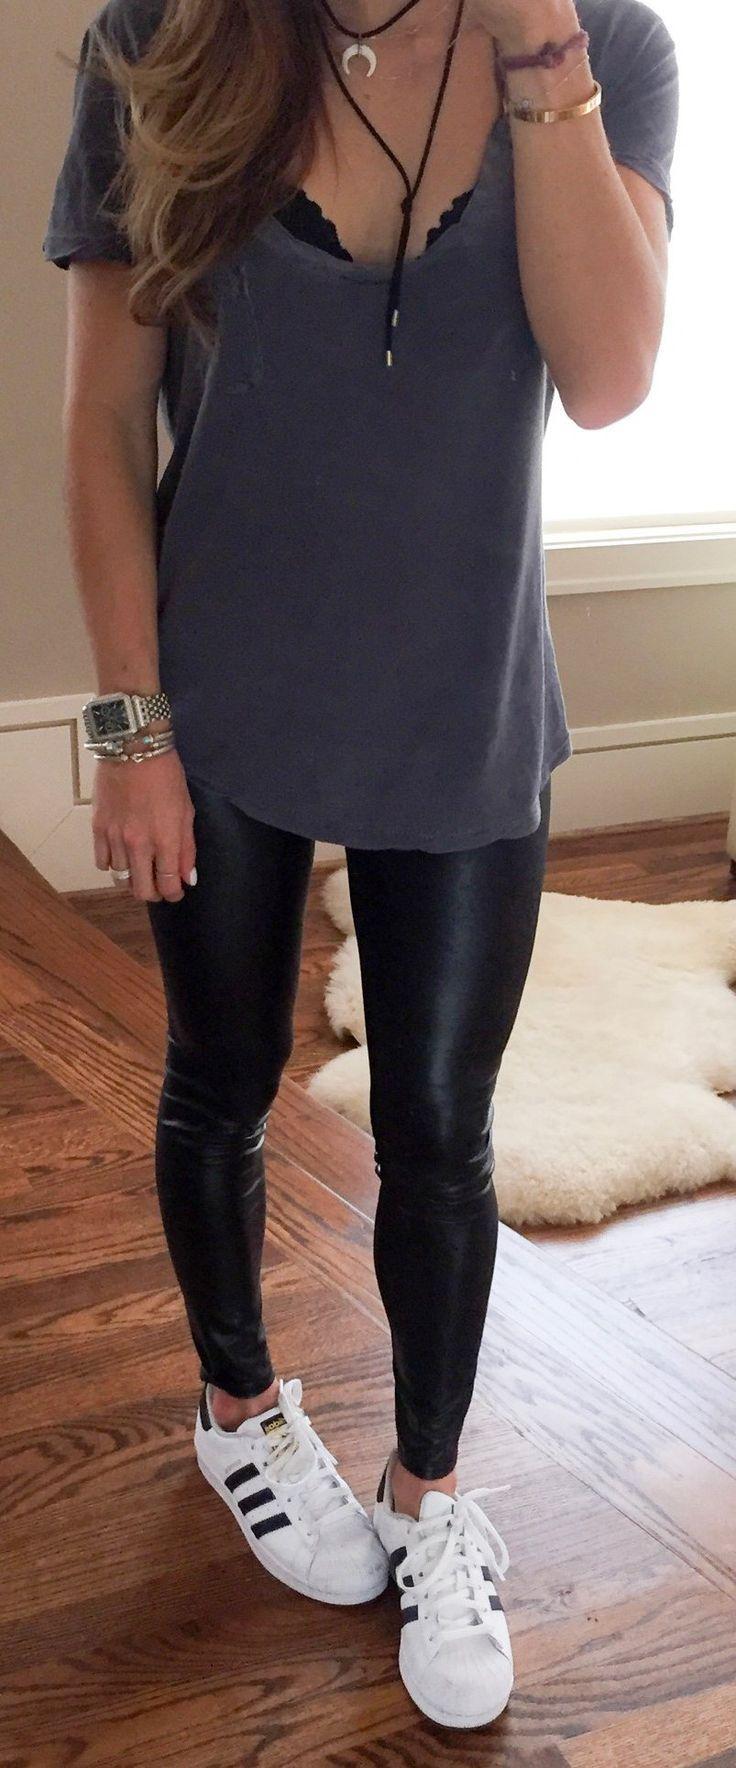 4c58f18c56a Best 25 Black leggings outfit ideas on Pinterest